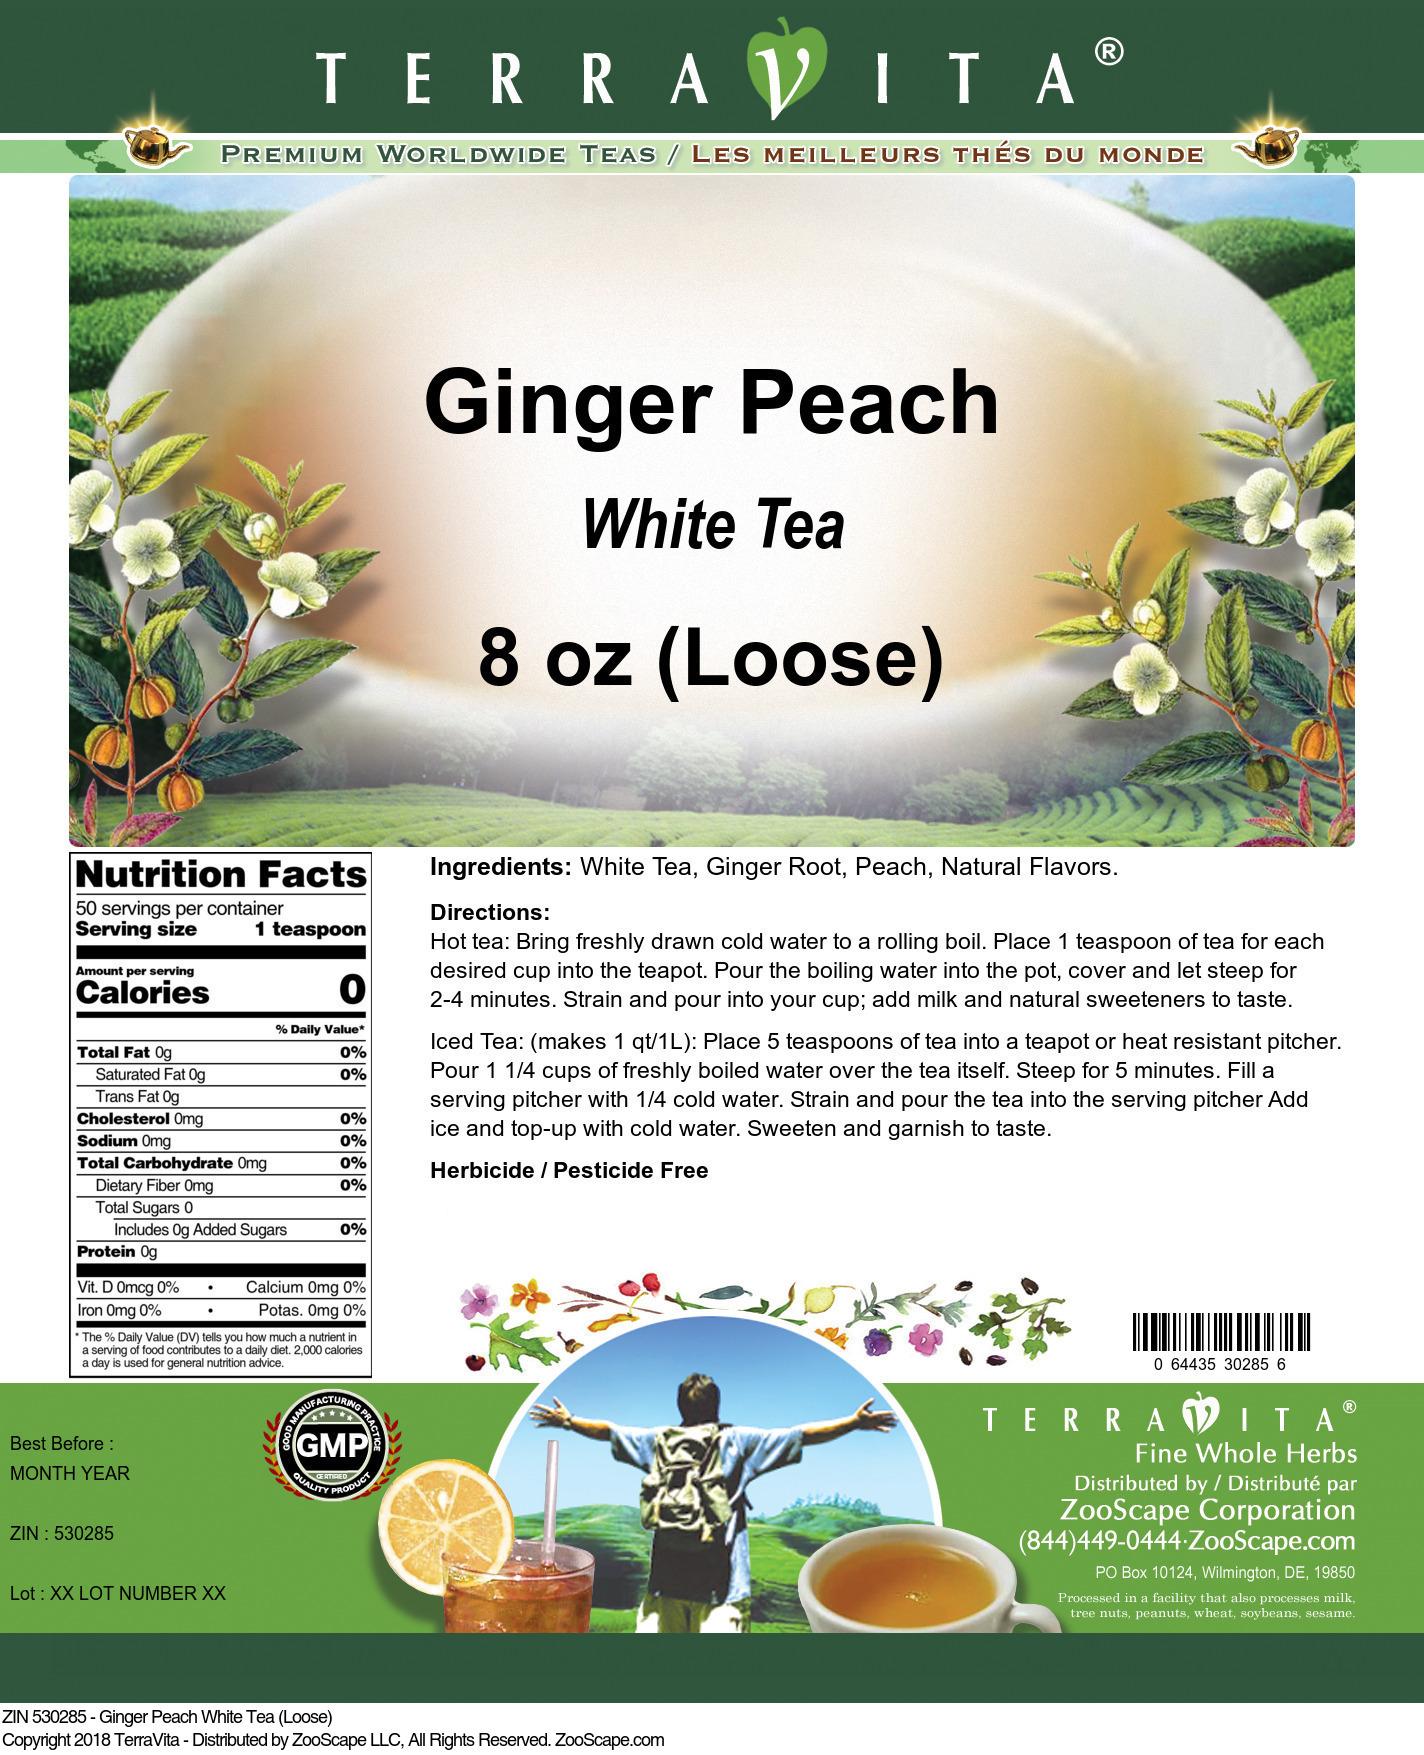 Ginger Peach White Tea (Loose)